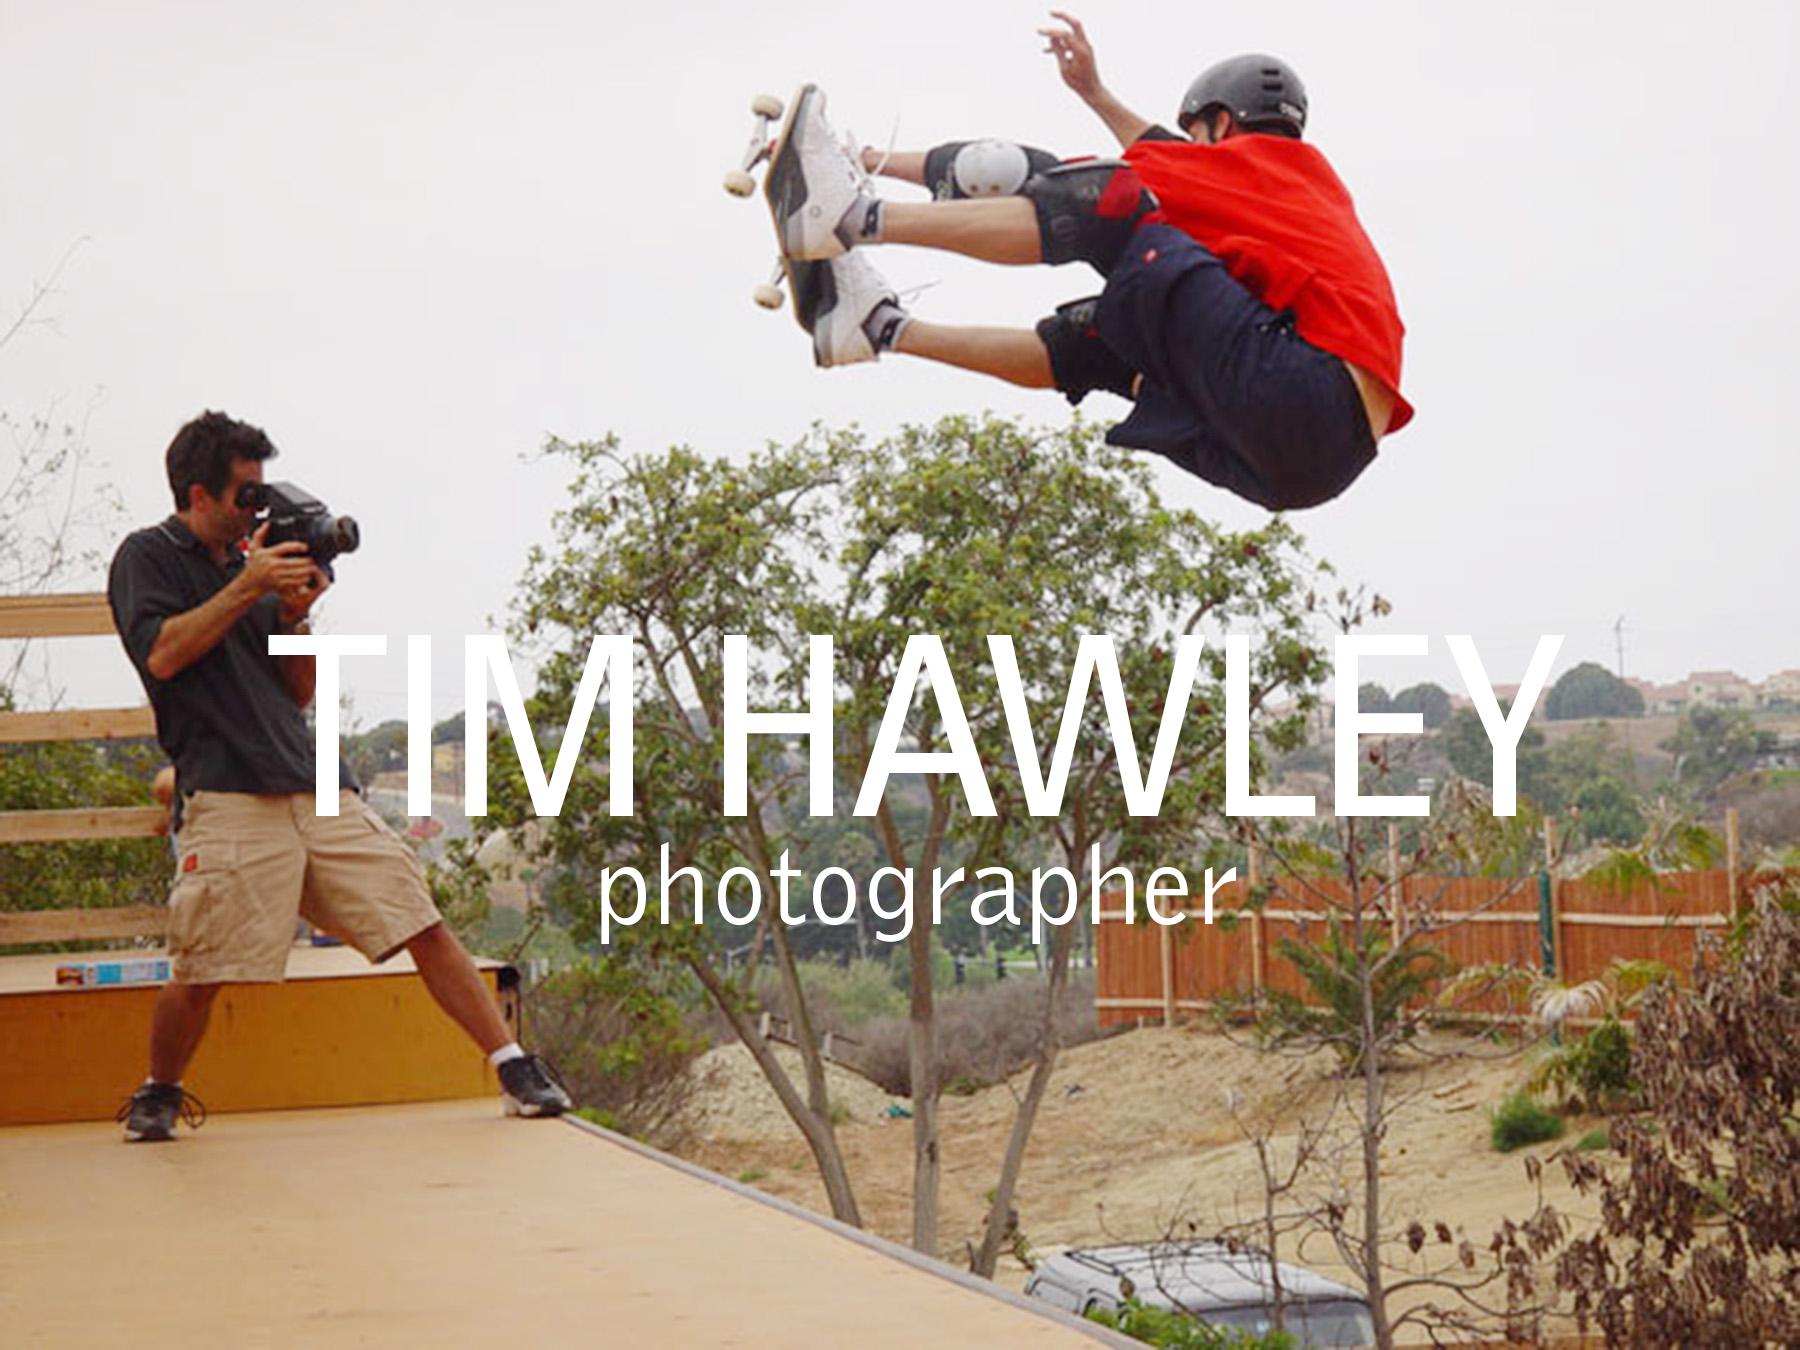 timhawley_name2.jpg